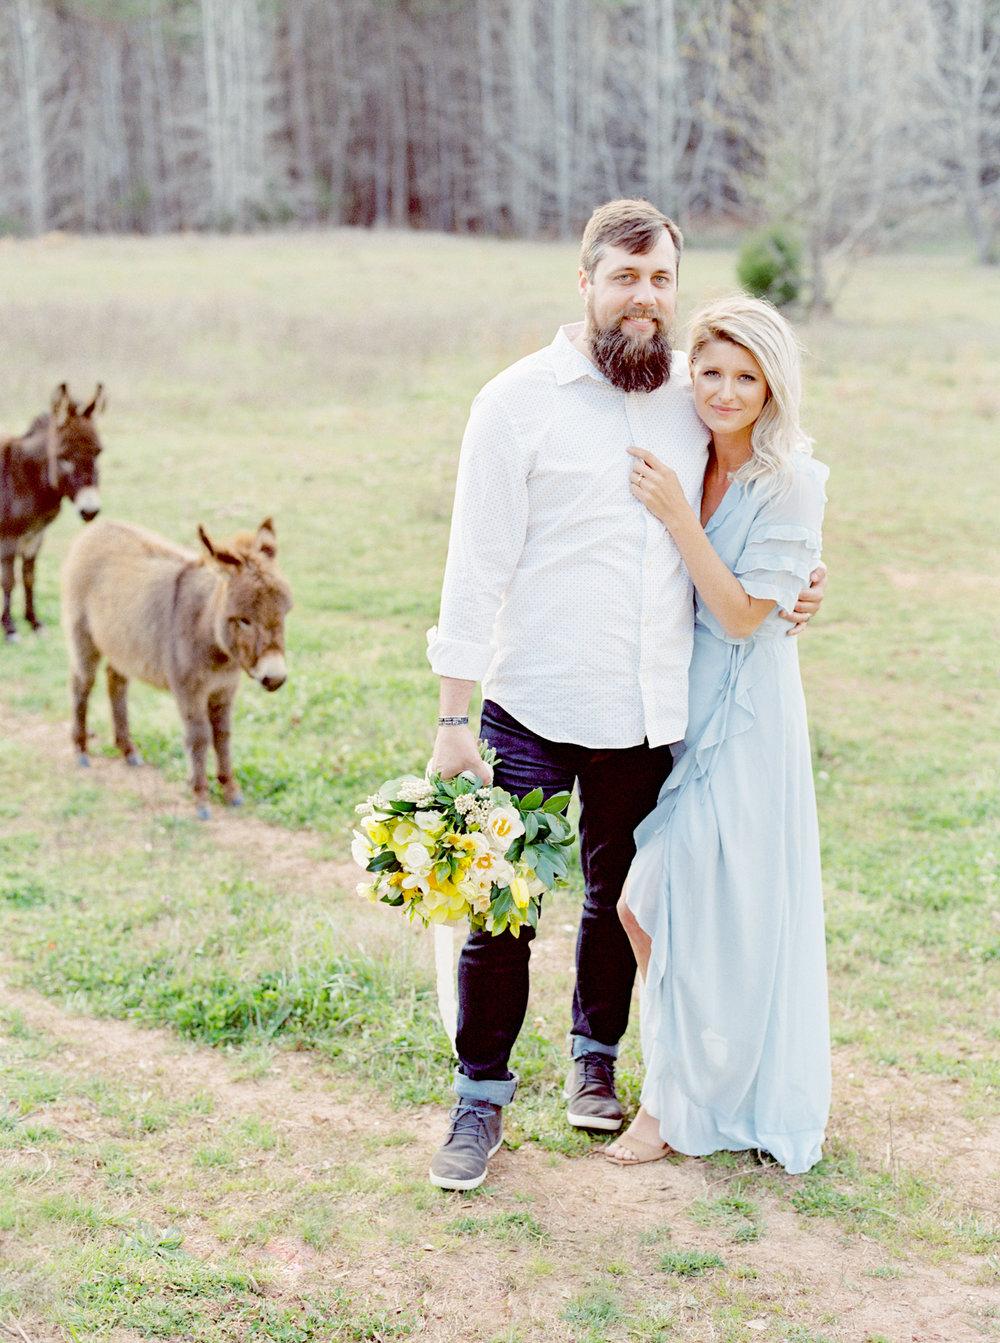 hannah forsberg atlanta wedding photographer whitney spence anniversary session with miniature donkeys and horse-29.jpg